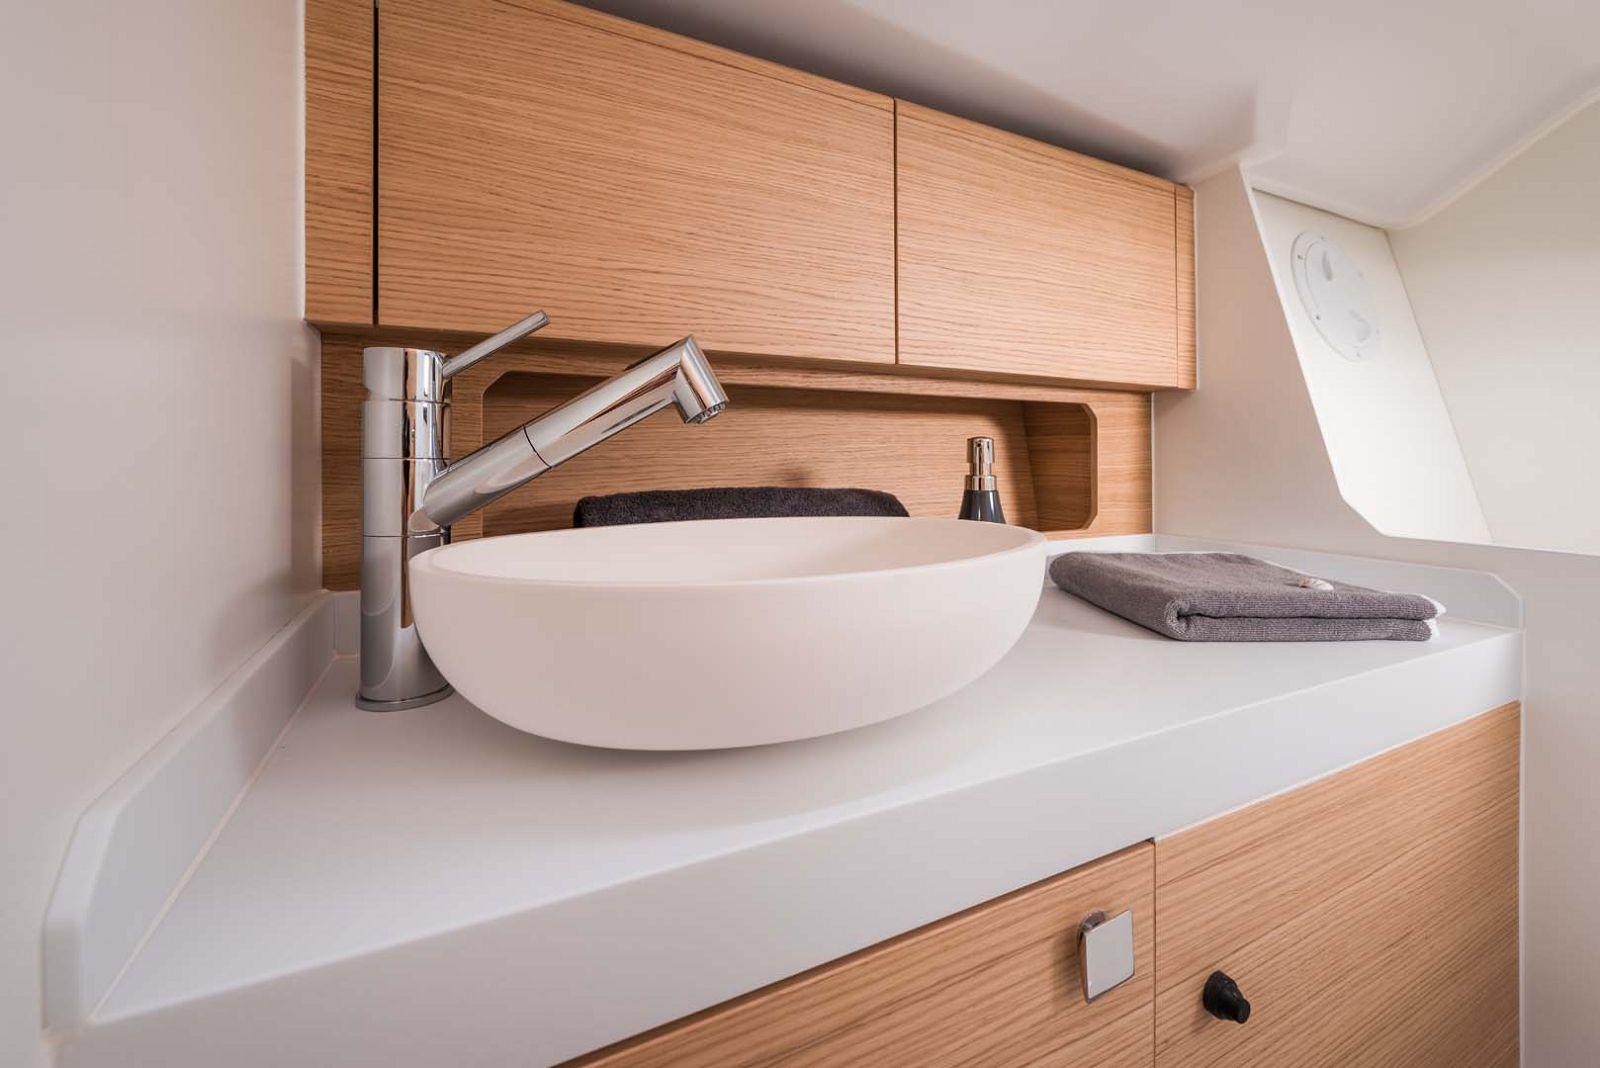 Elan-Yachts-E3-Sailboat-head-sink